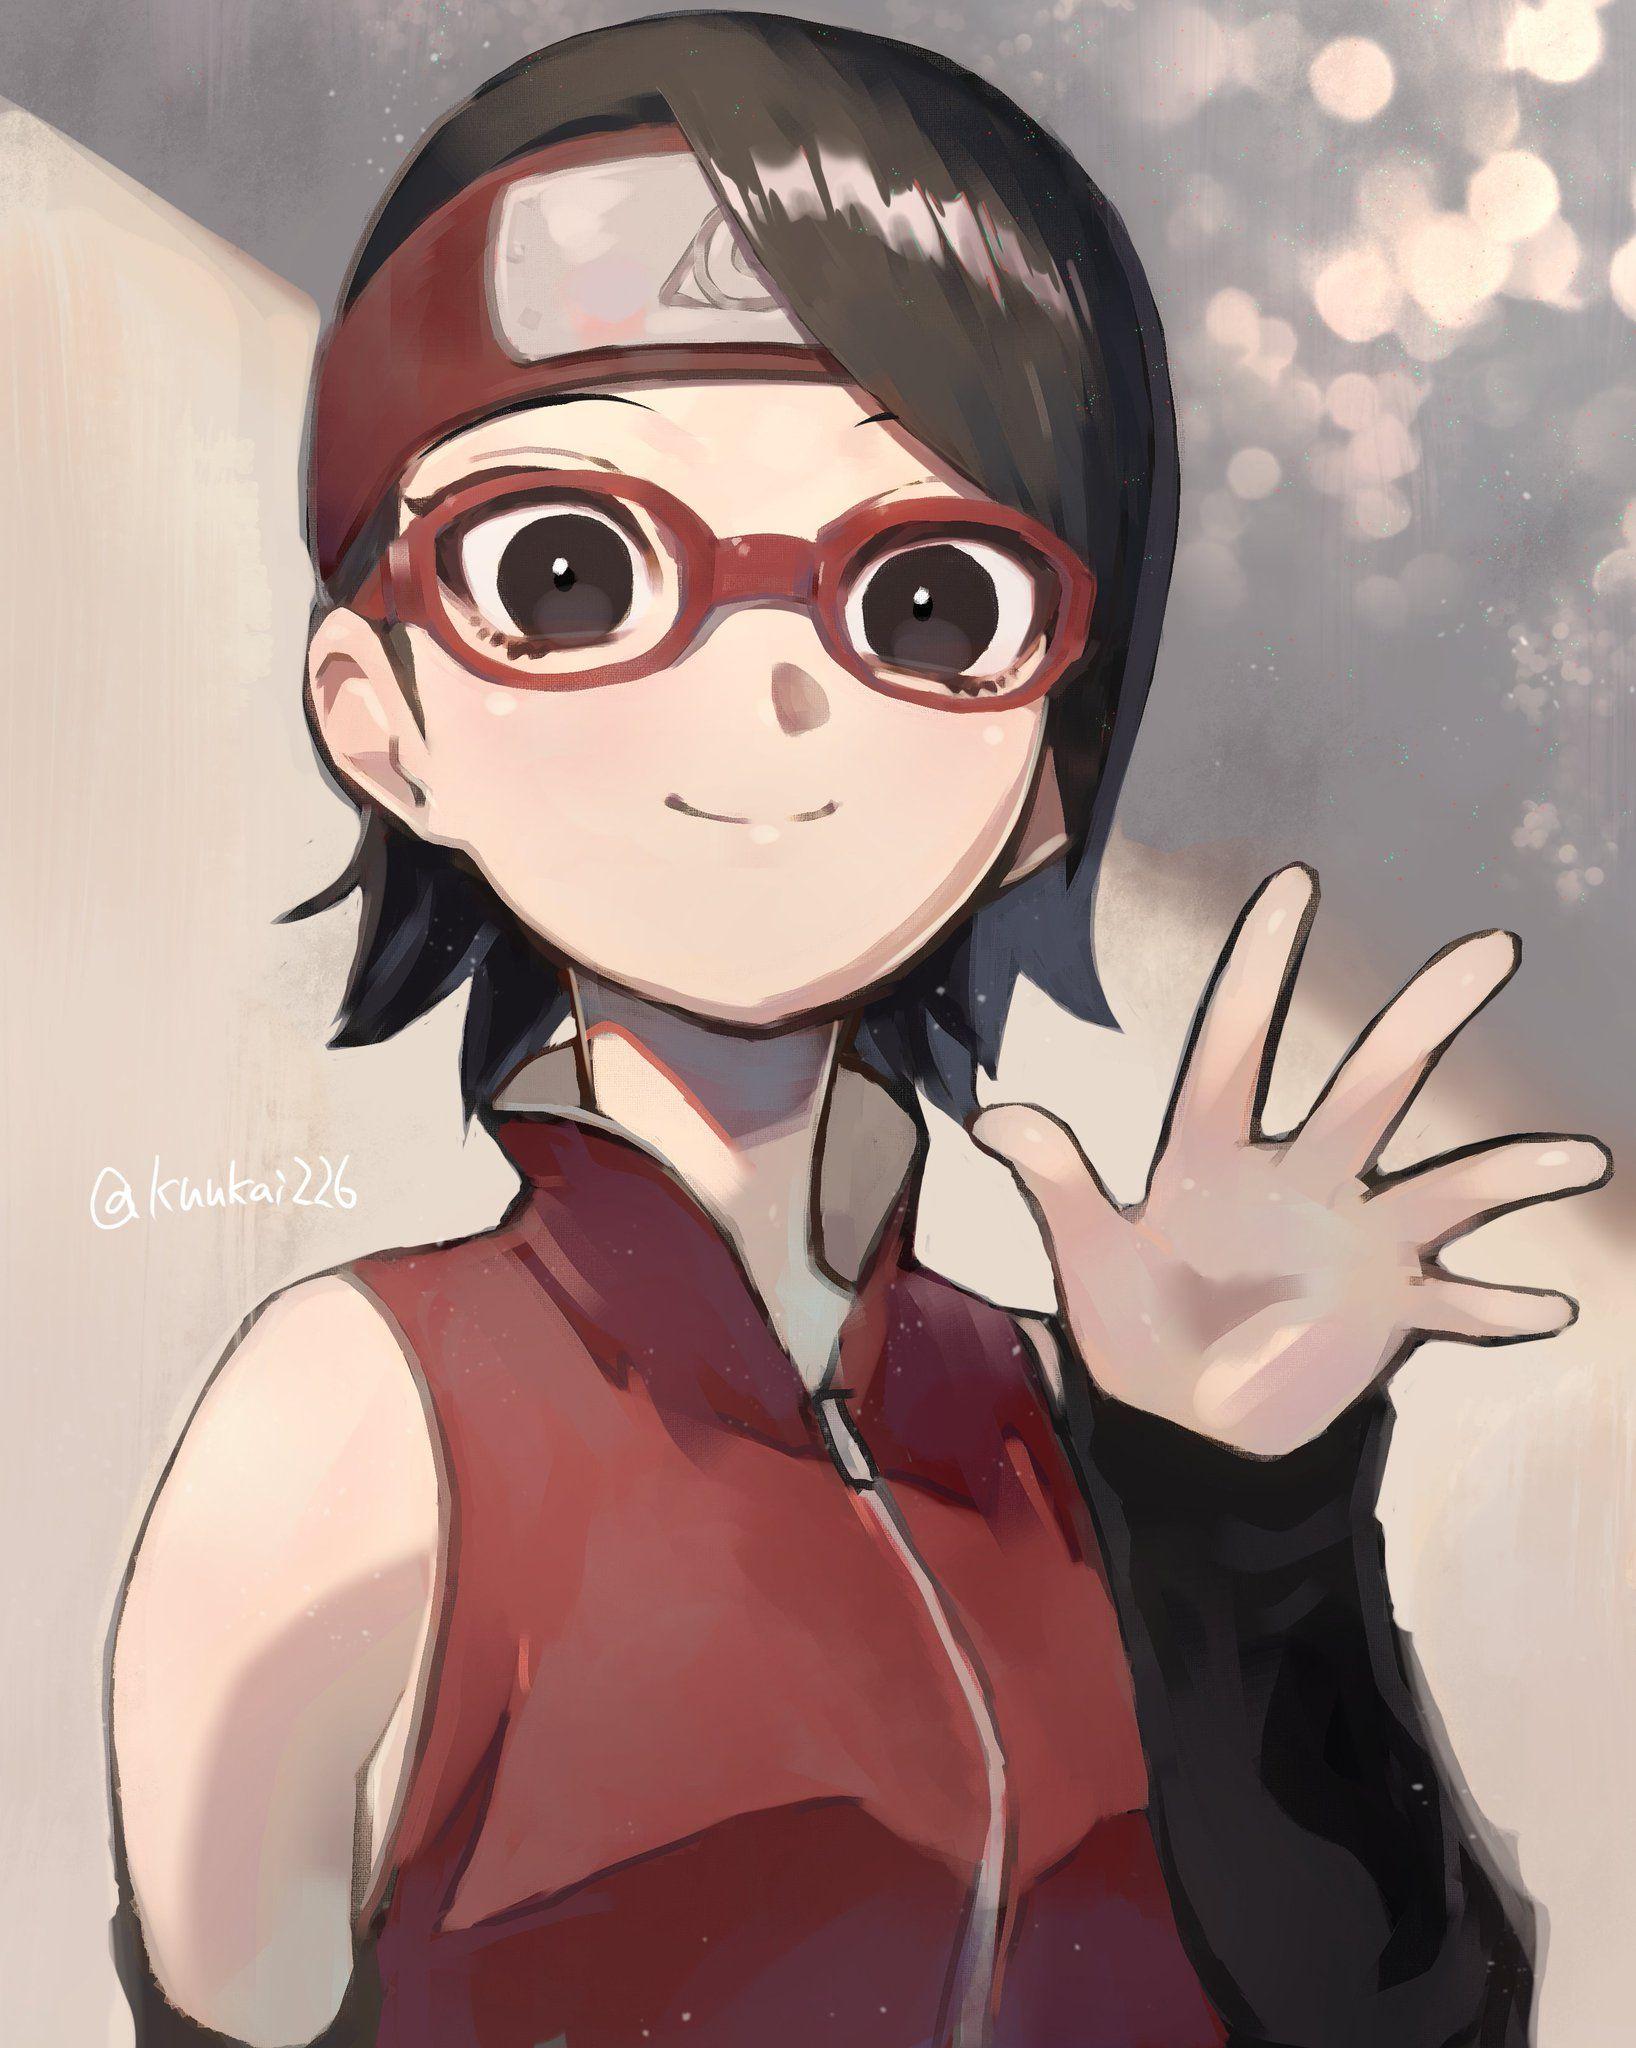 武者修業 on in 2020 Boruto, Sasuke sakura, Anime naruto